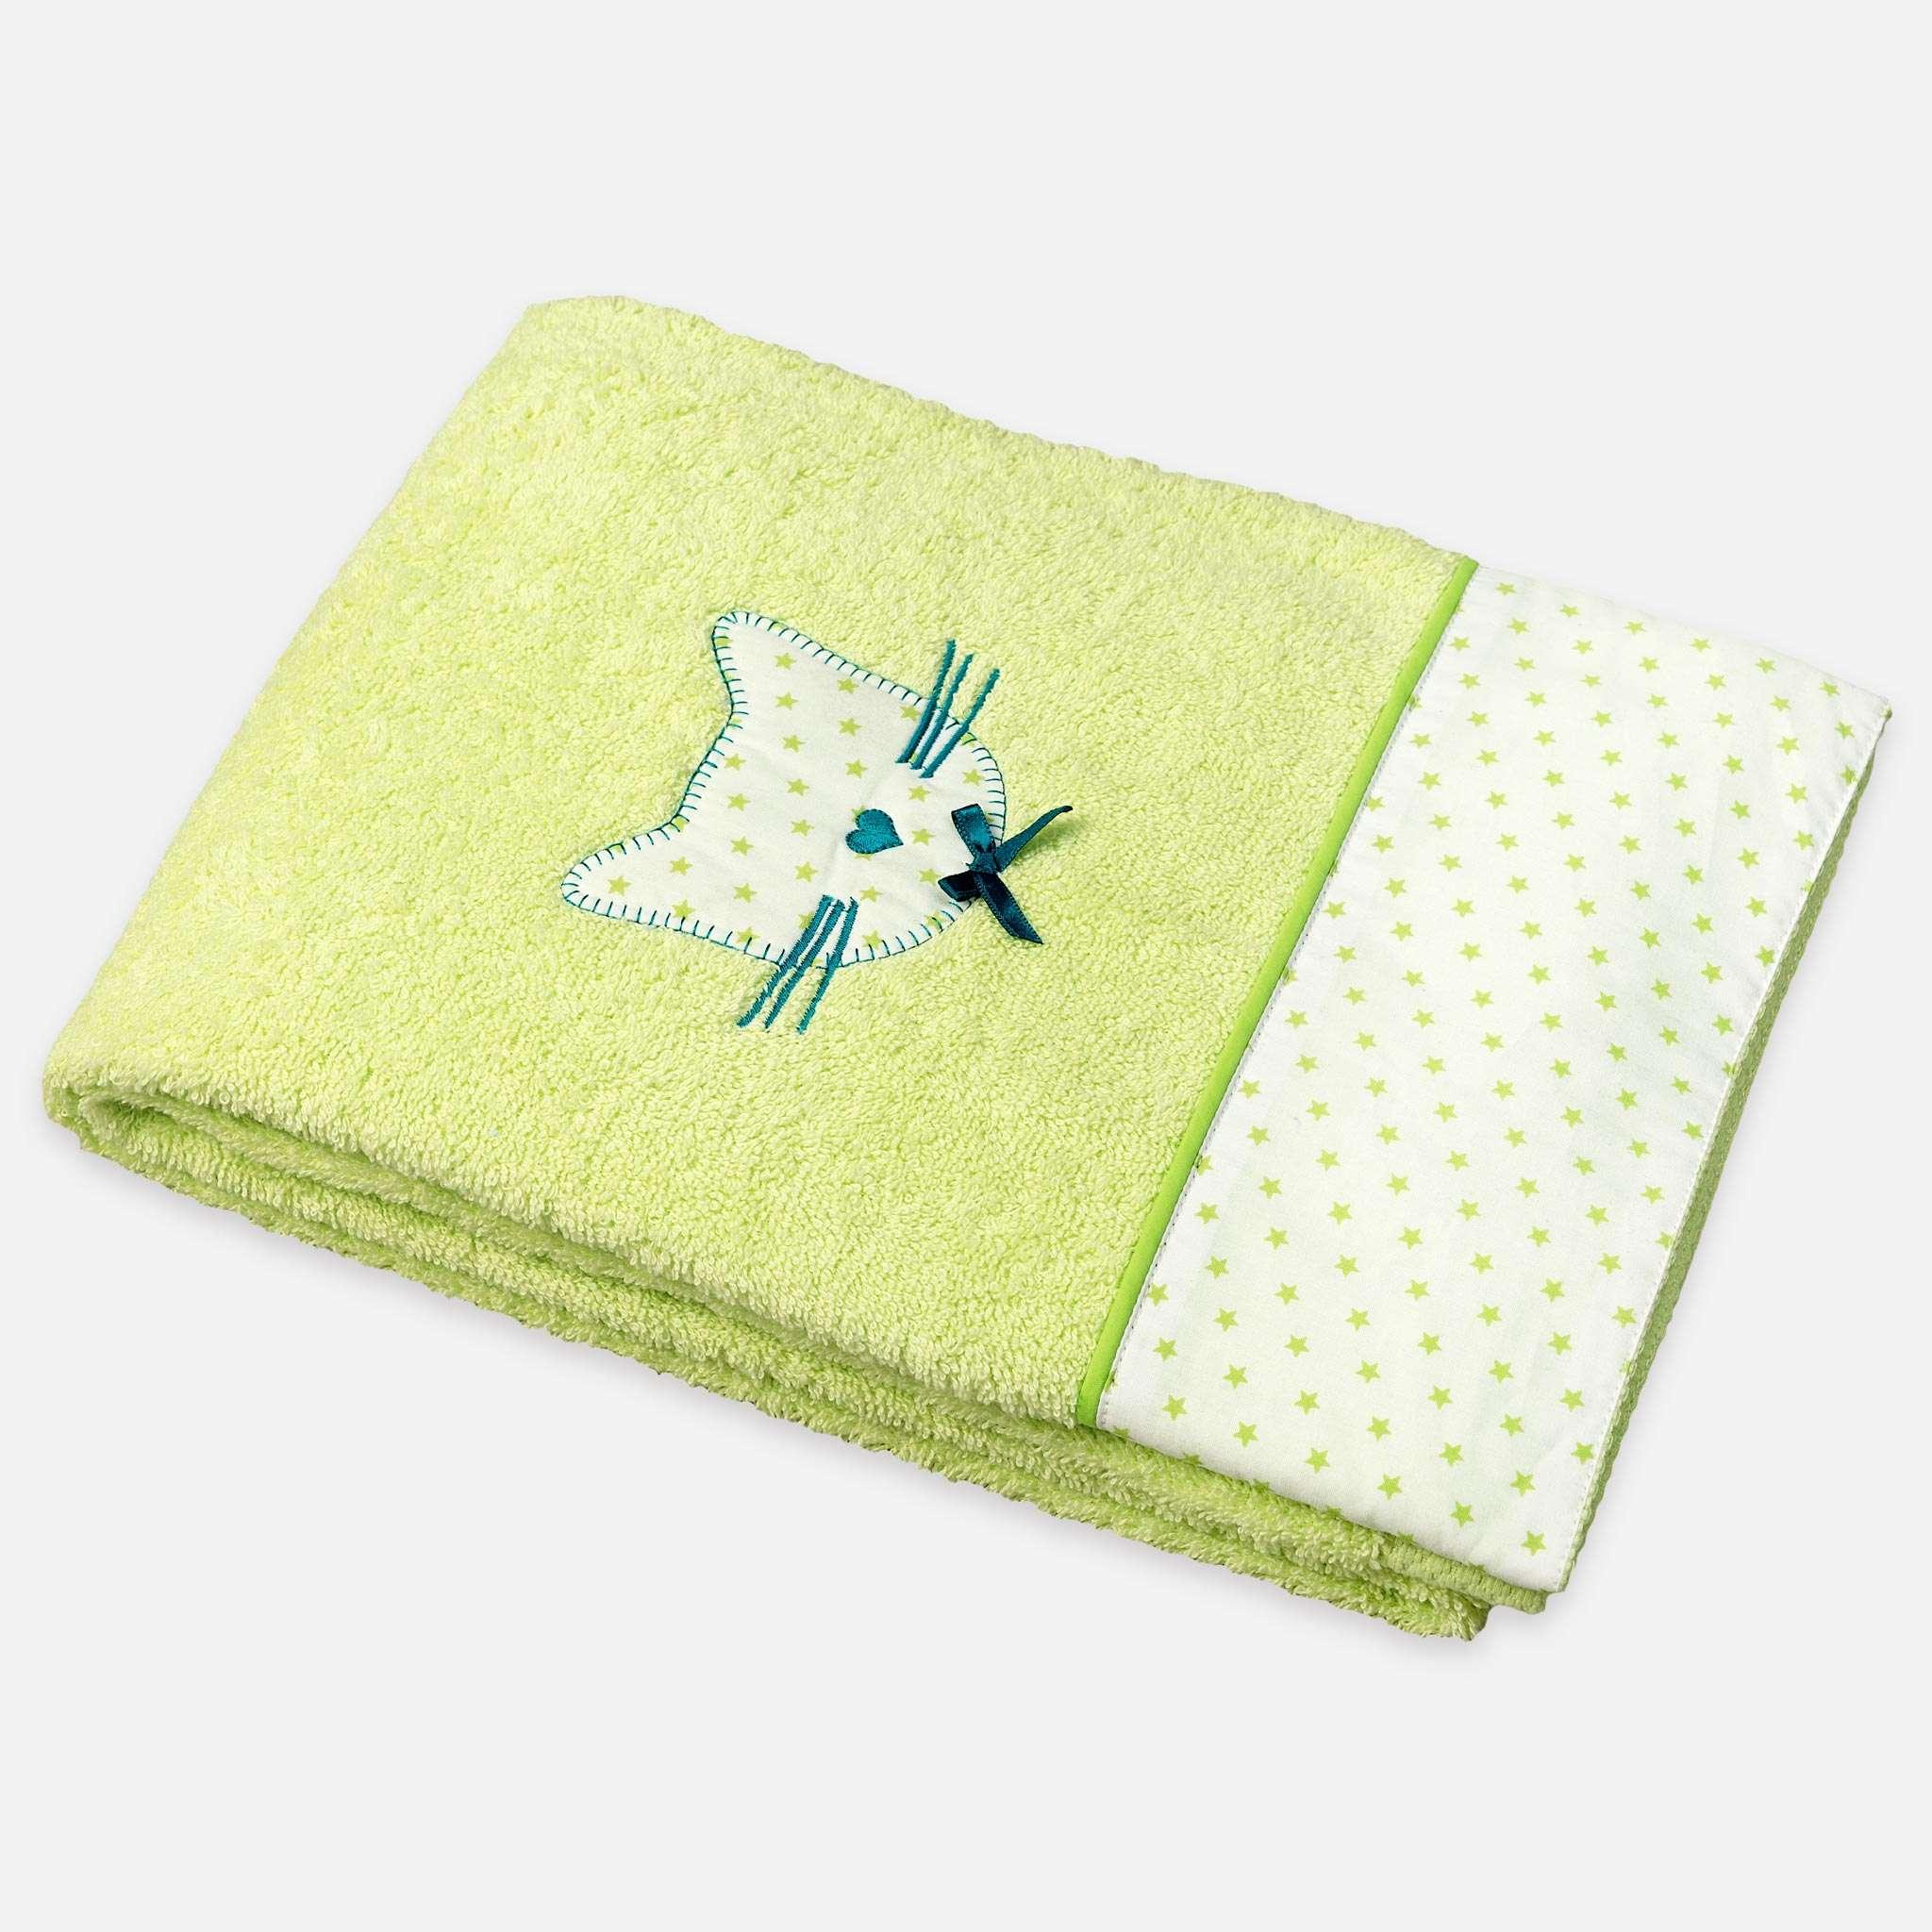 Handtuch, Cats 30x50 cm